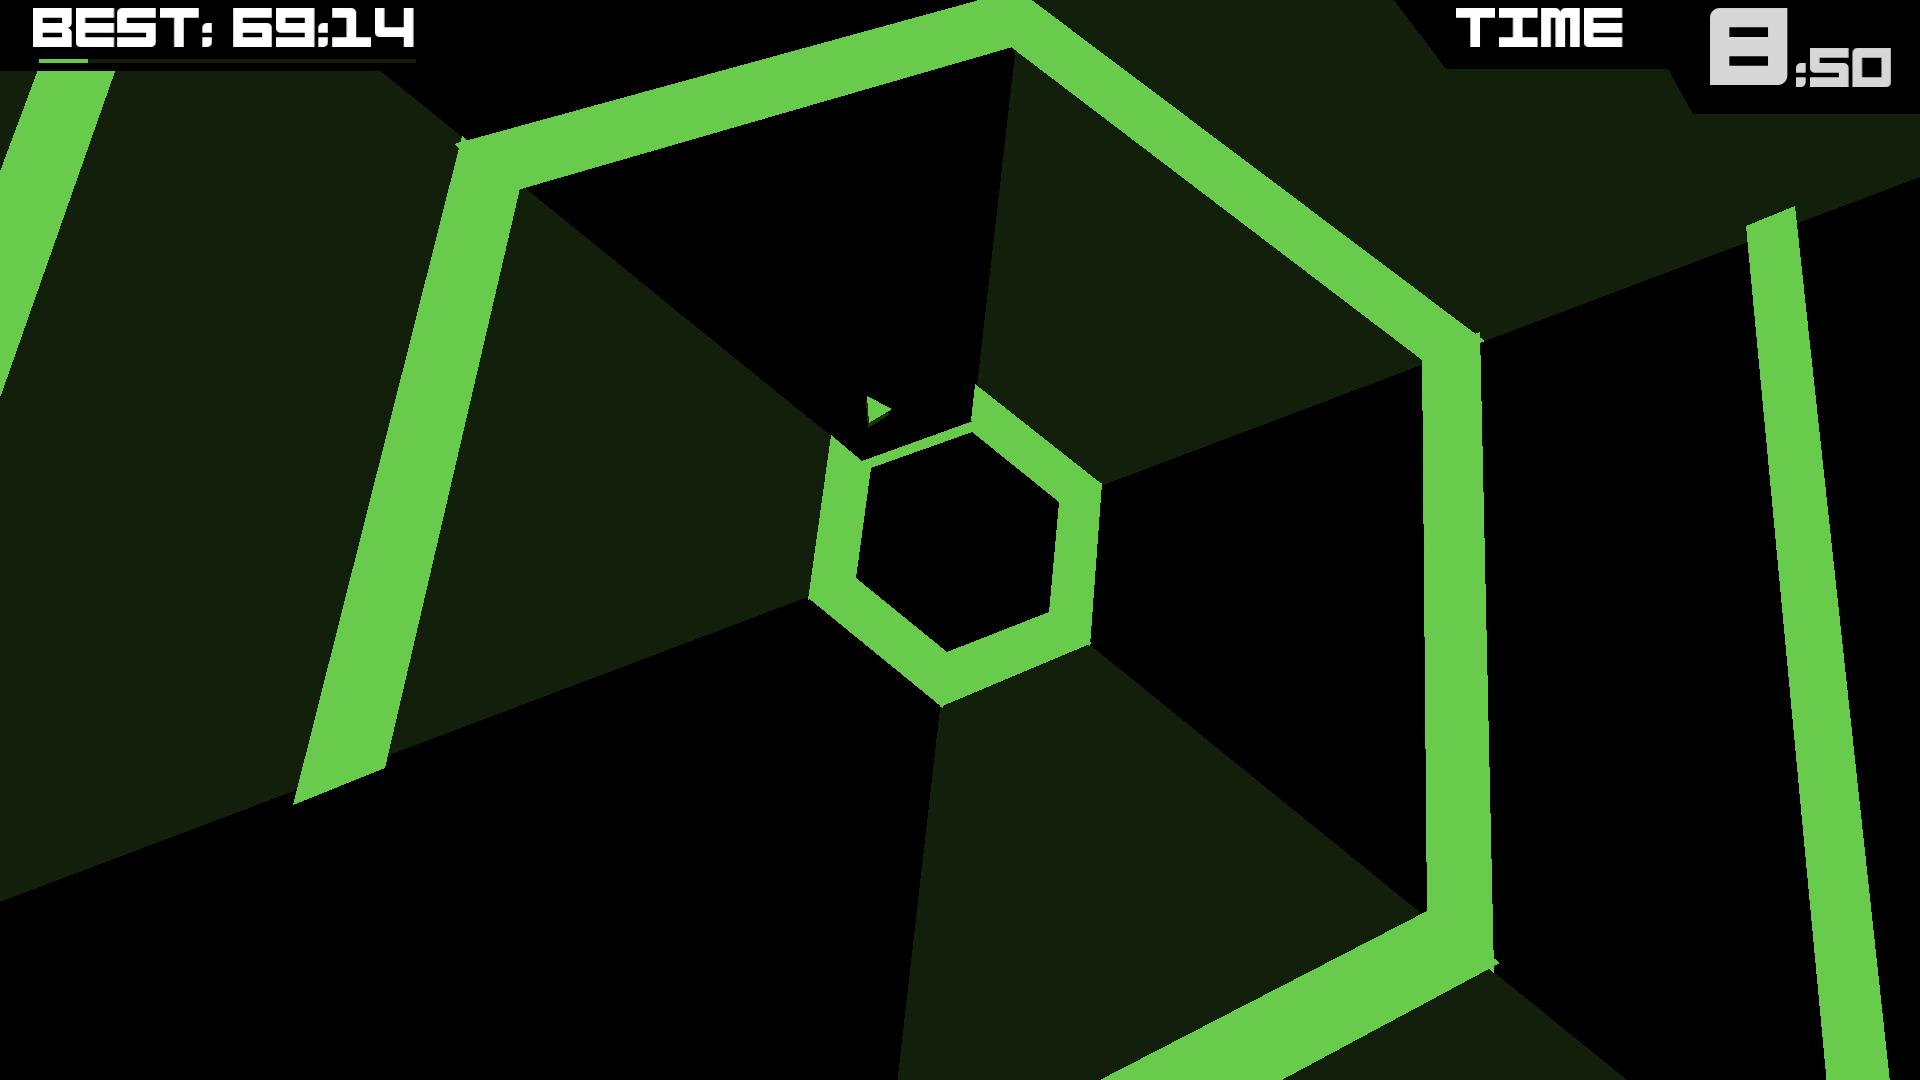 hexagon terry cavanagh games - HD1920×1080